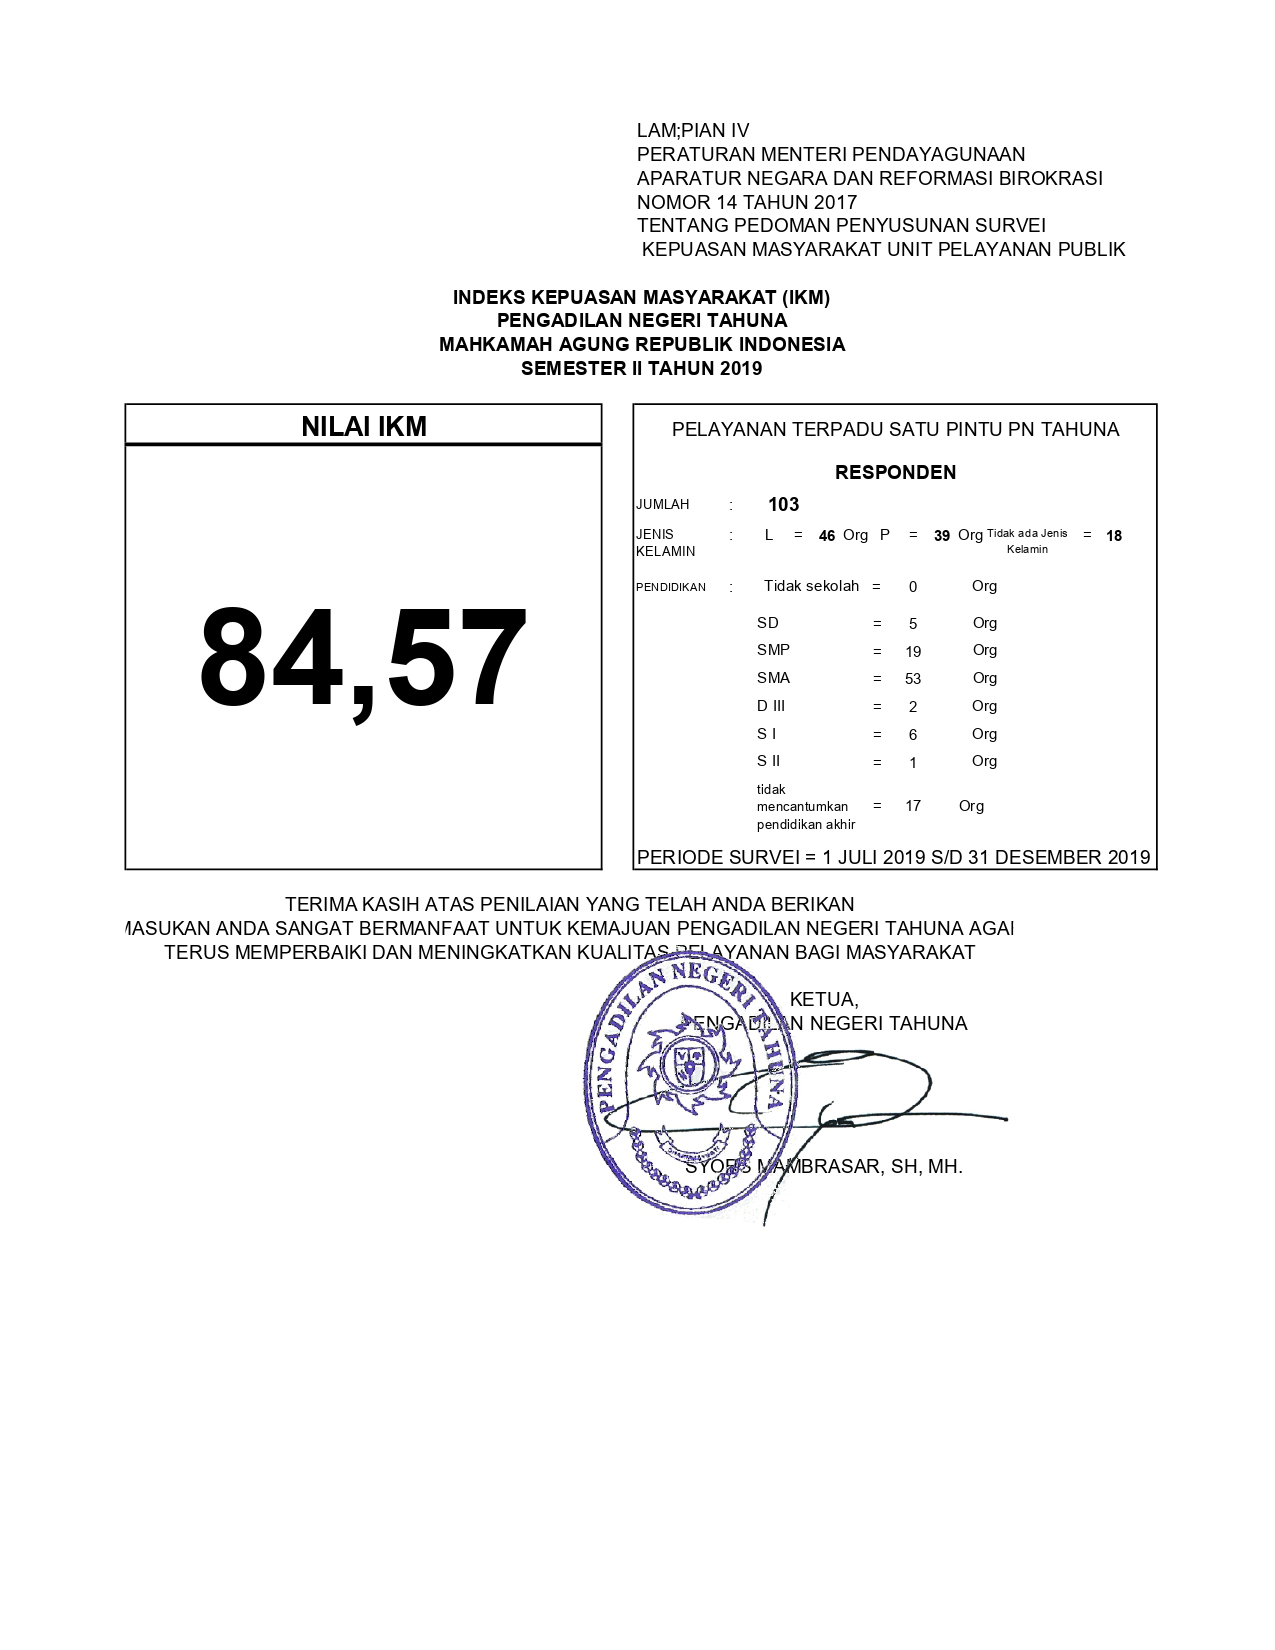 Publikasi Survey IKM Semester II 2019